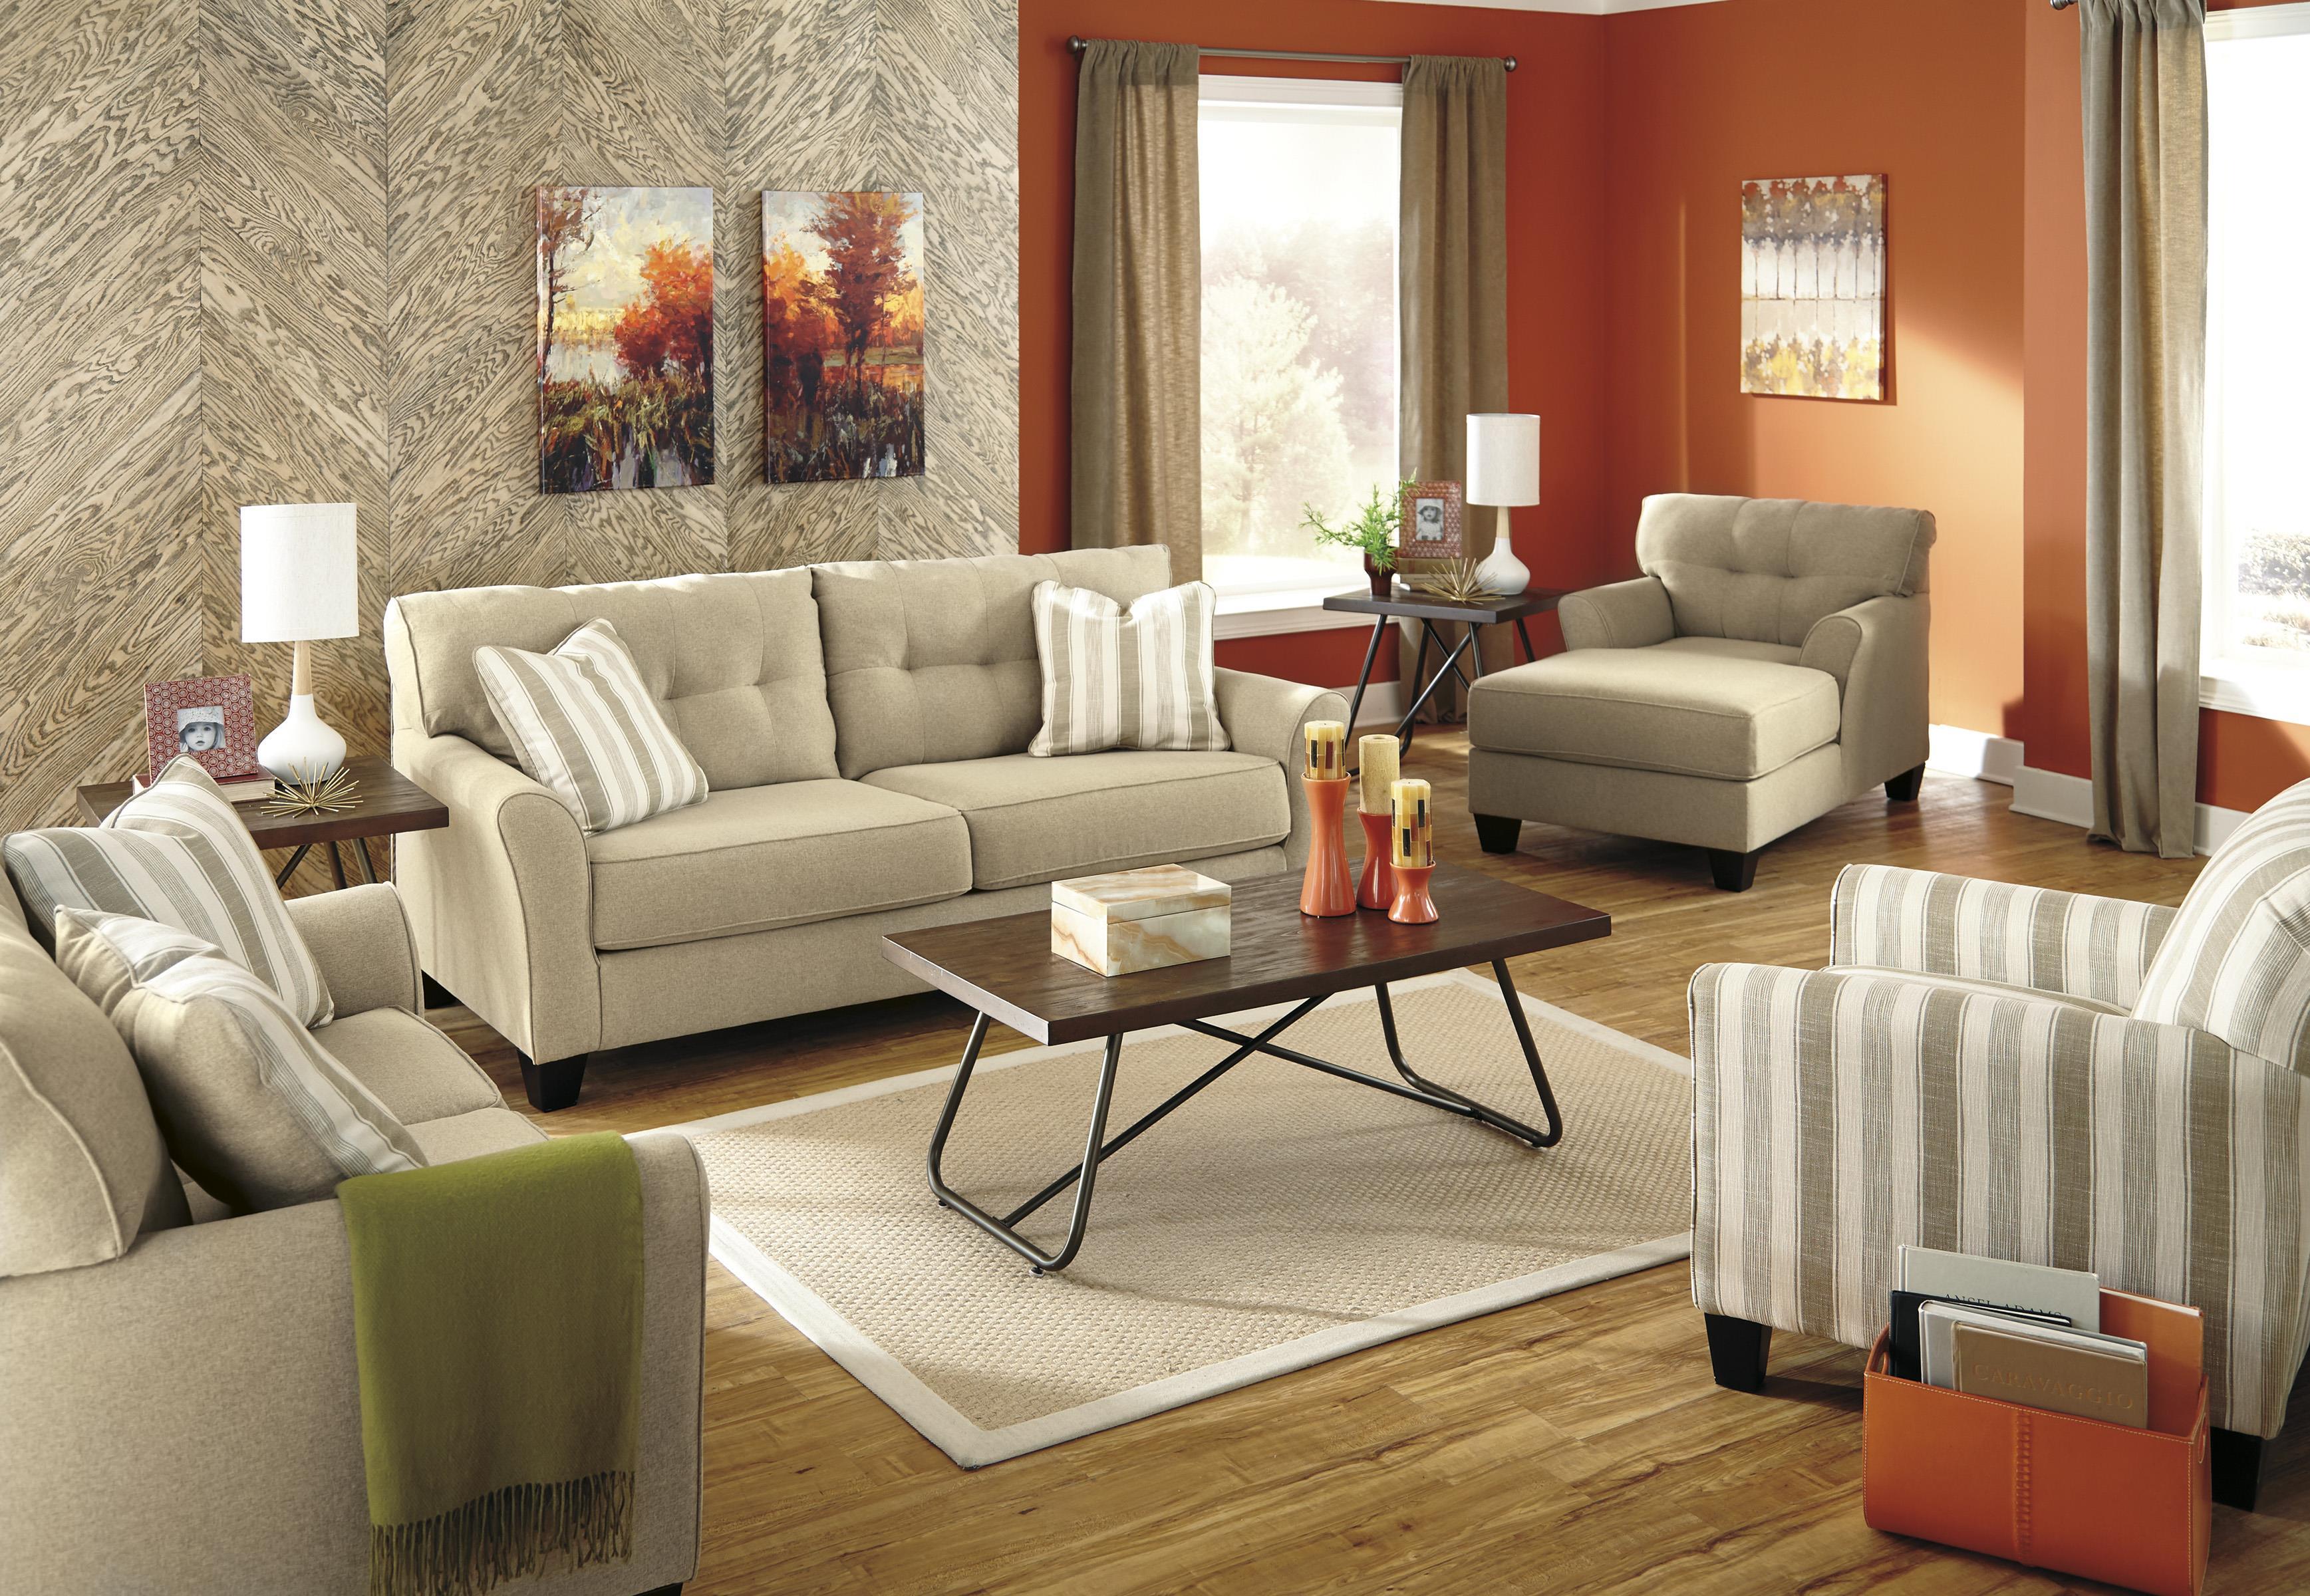 Benchcraft Laryn Stationary Living Room Group - Item Number: 51902 Living Room Group 5